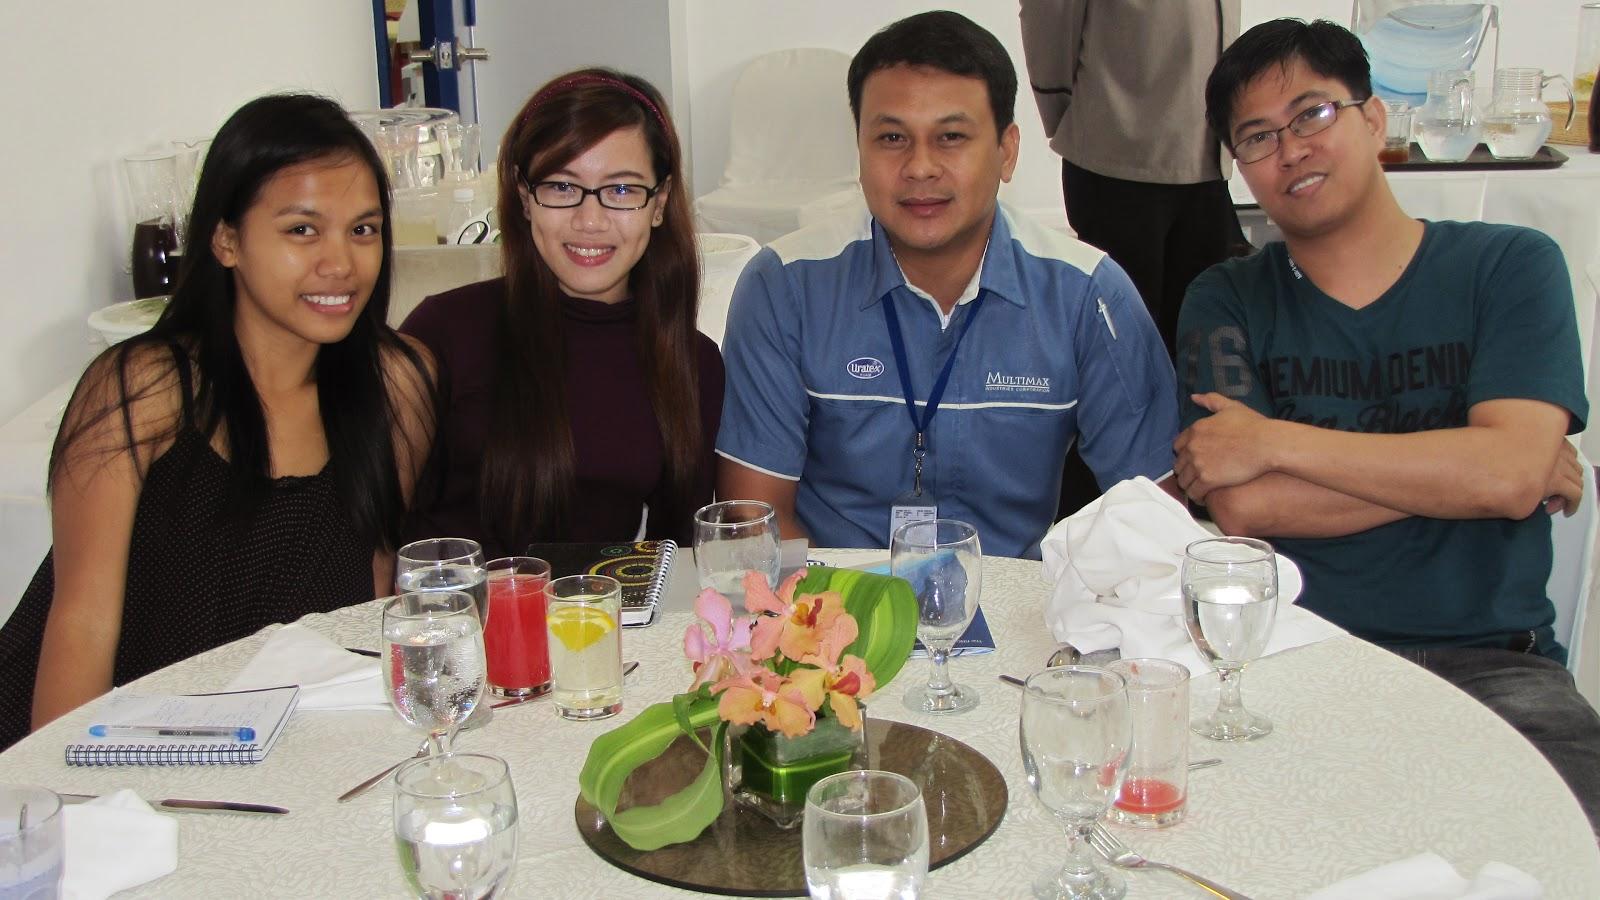 Uratex Cebu, Janvic Canama, Gessa Condino, Cebu Bloggers, FTW! Blog